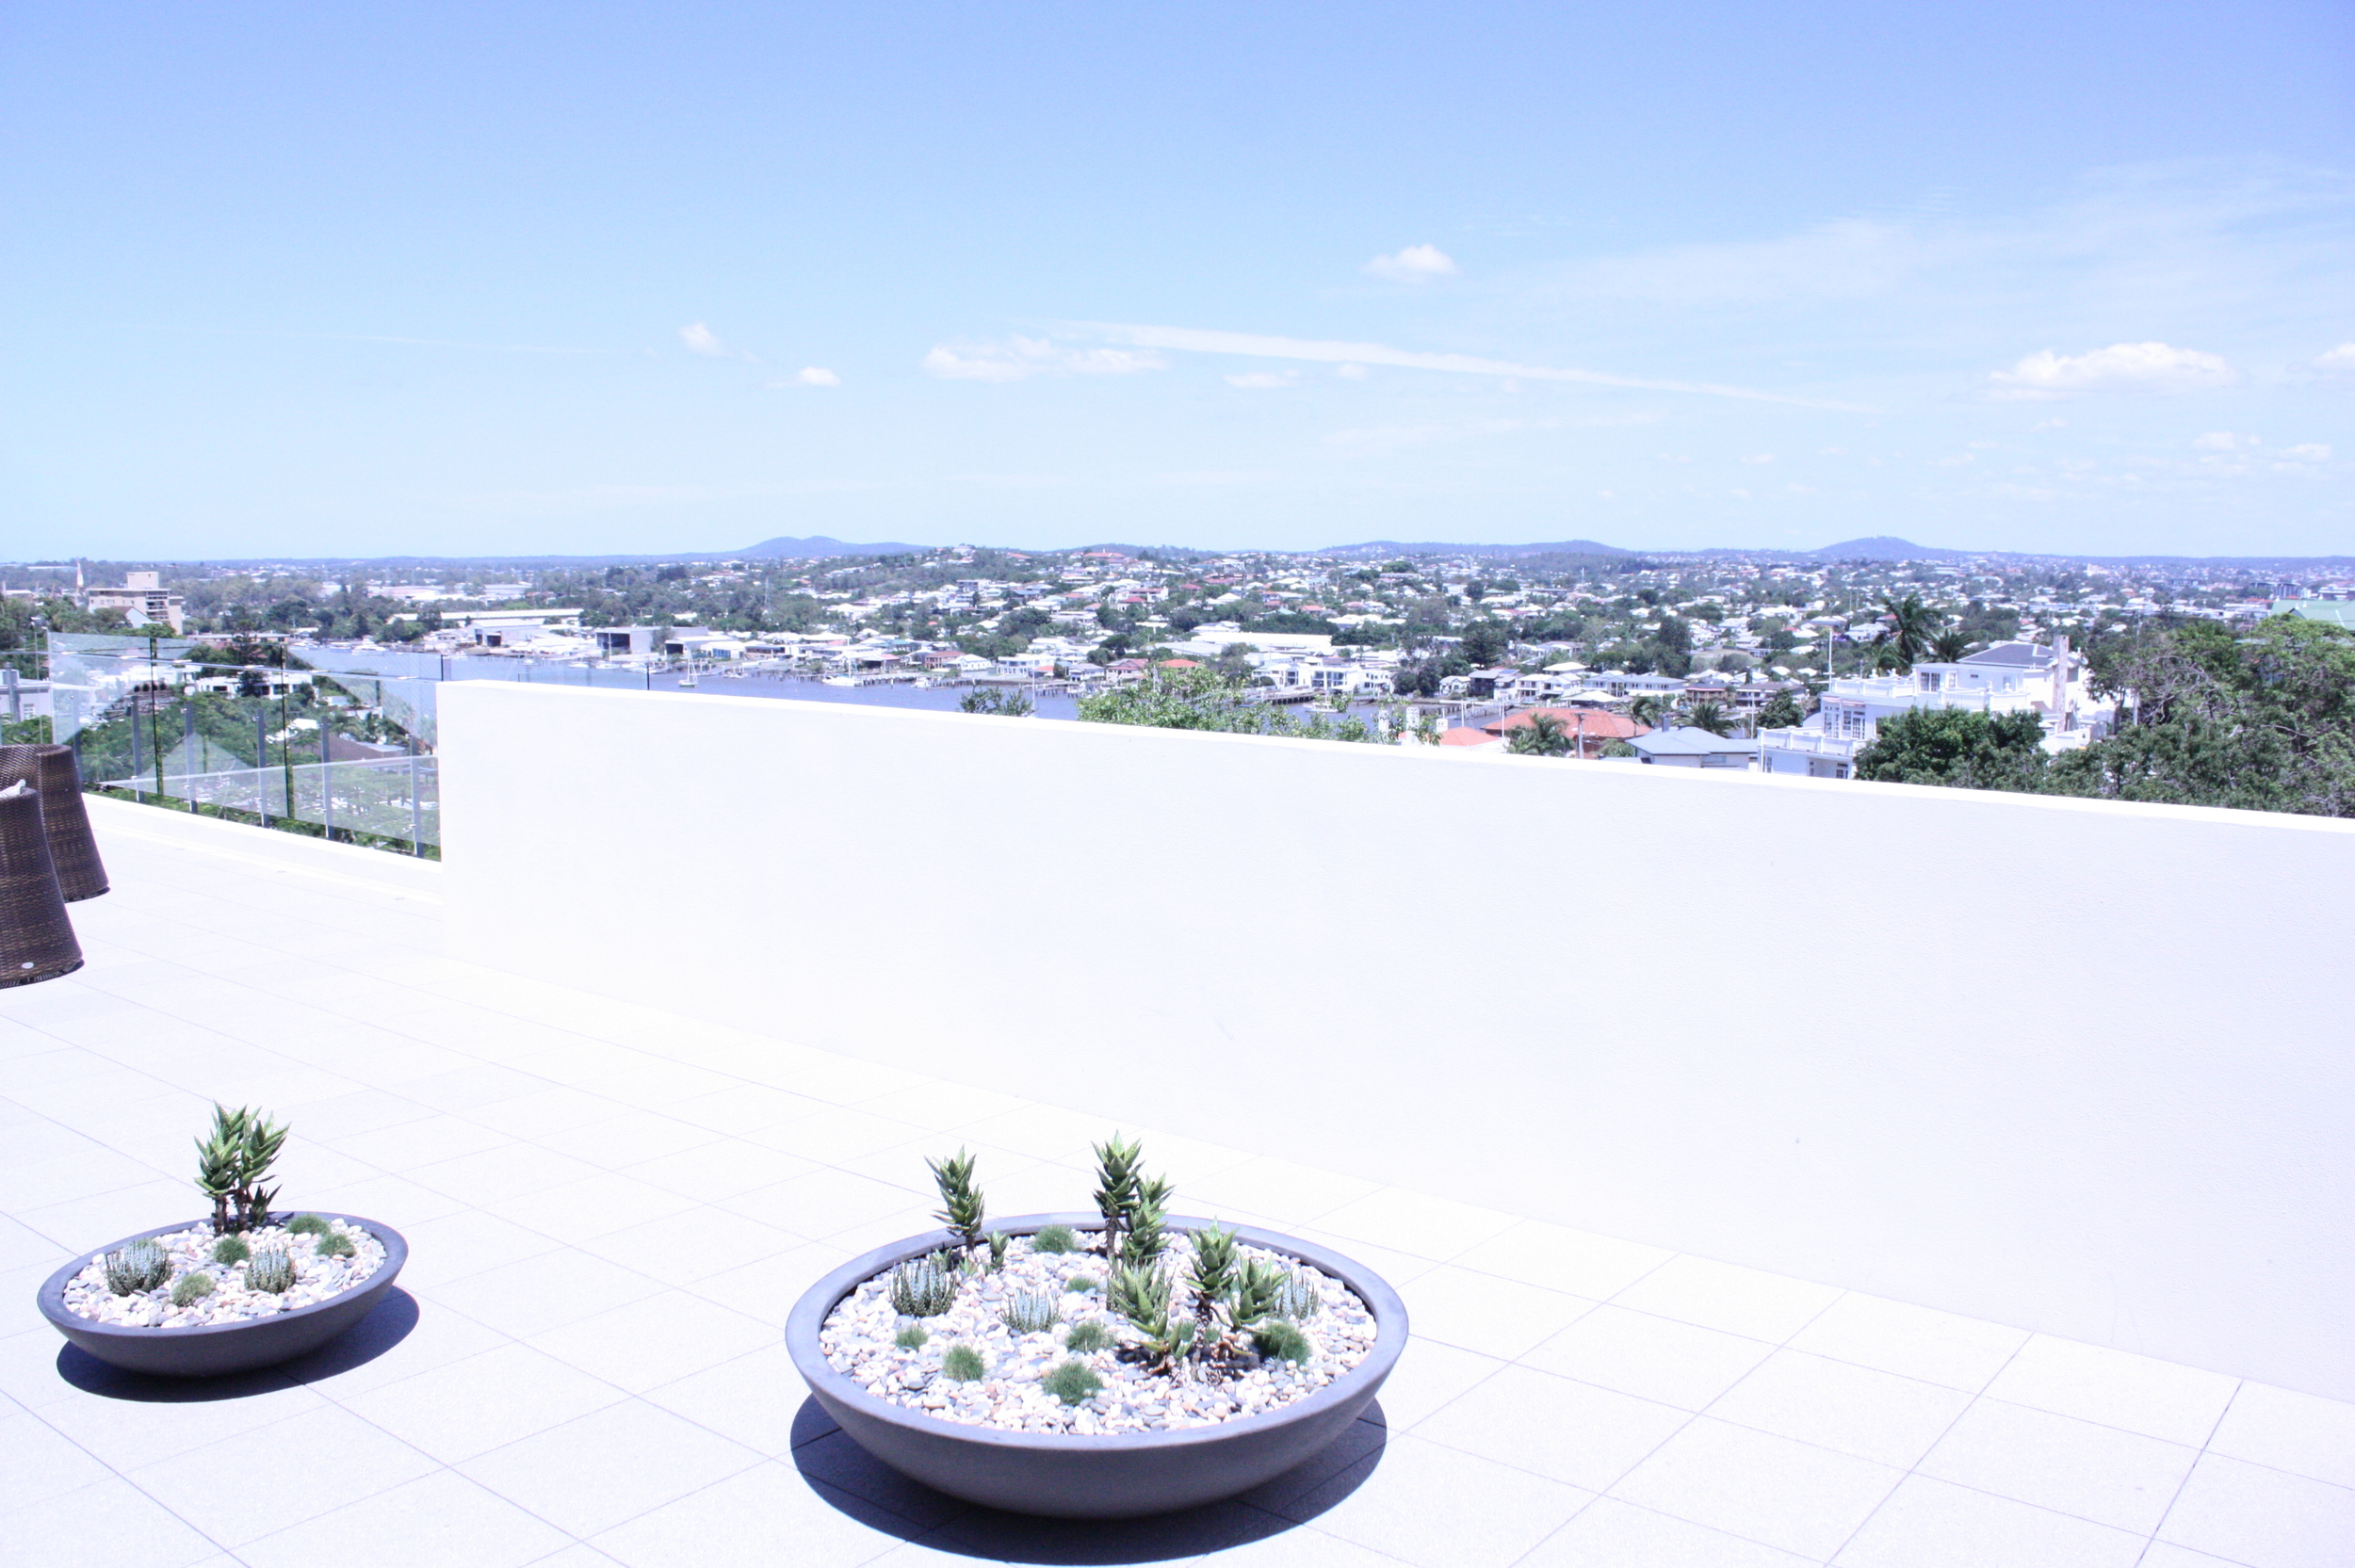 hamilton-rooftop-landscape-design-SEED15.JPG